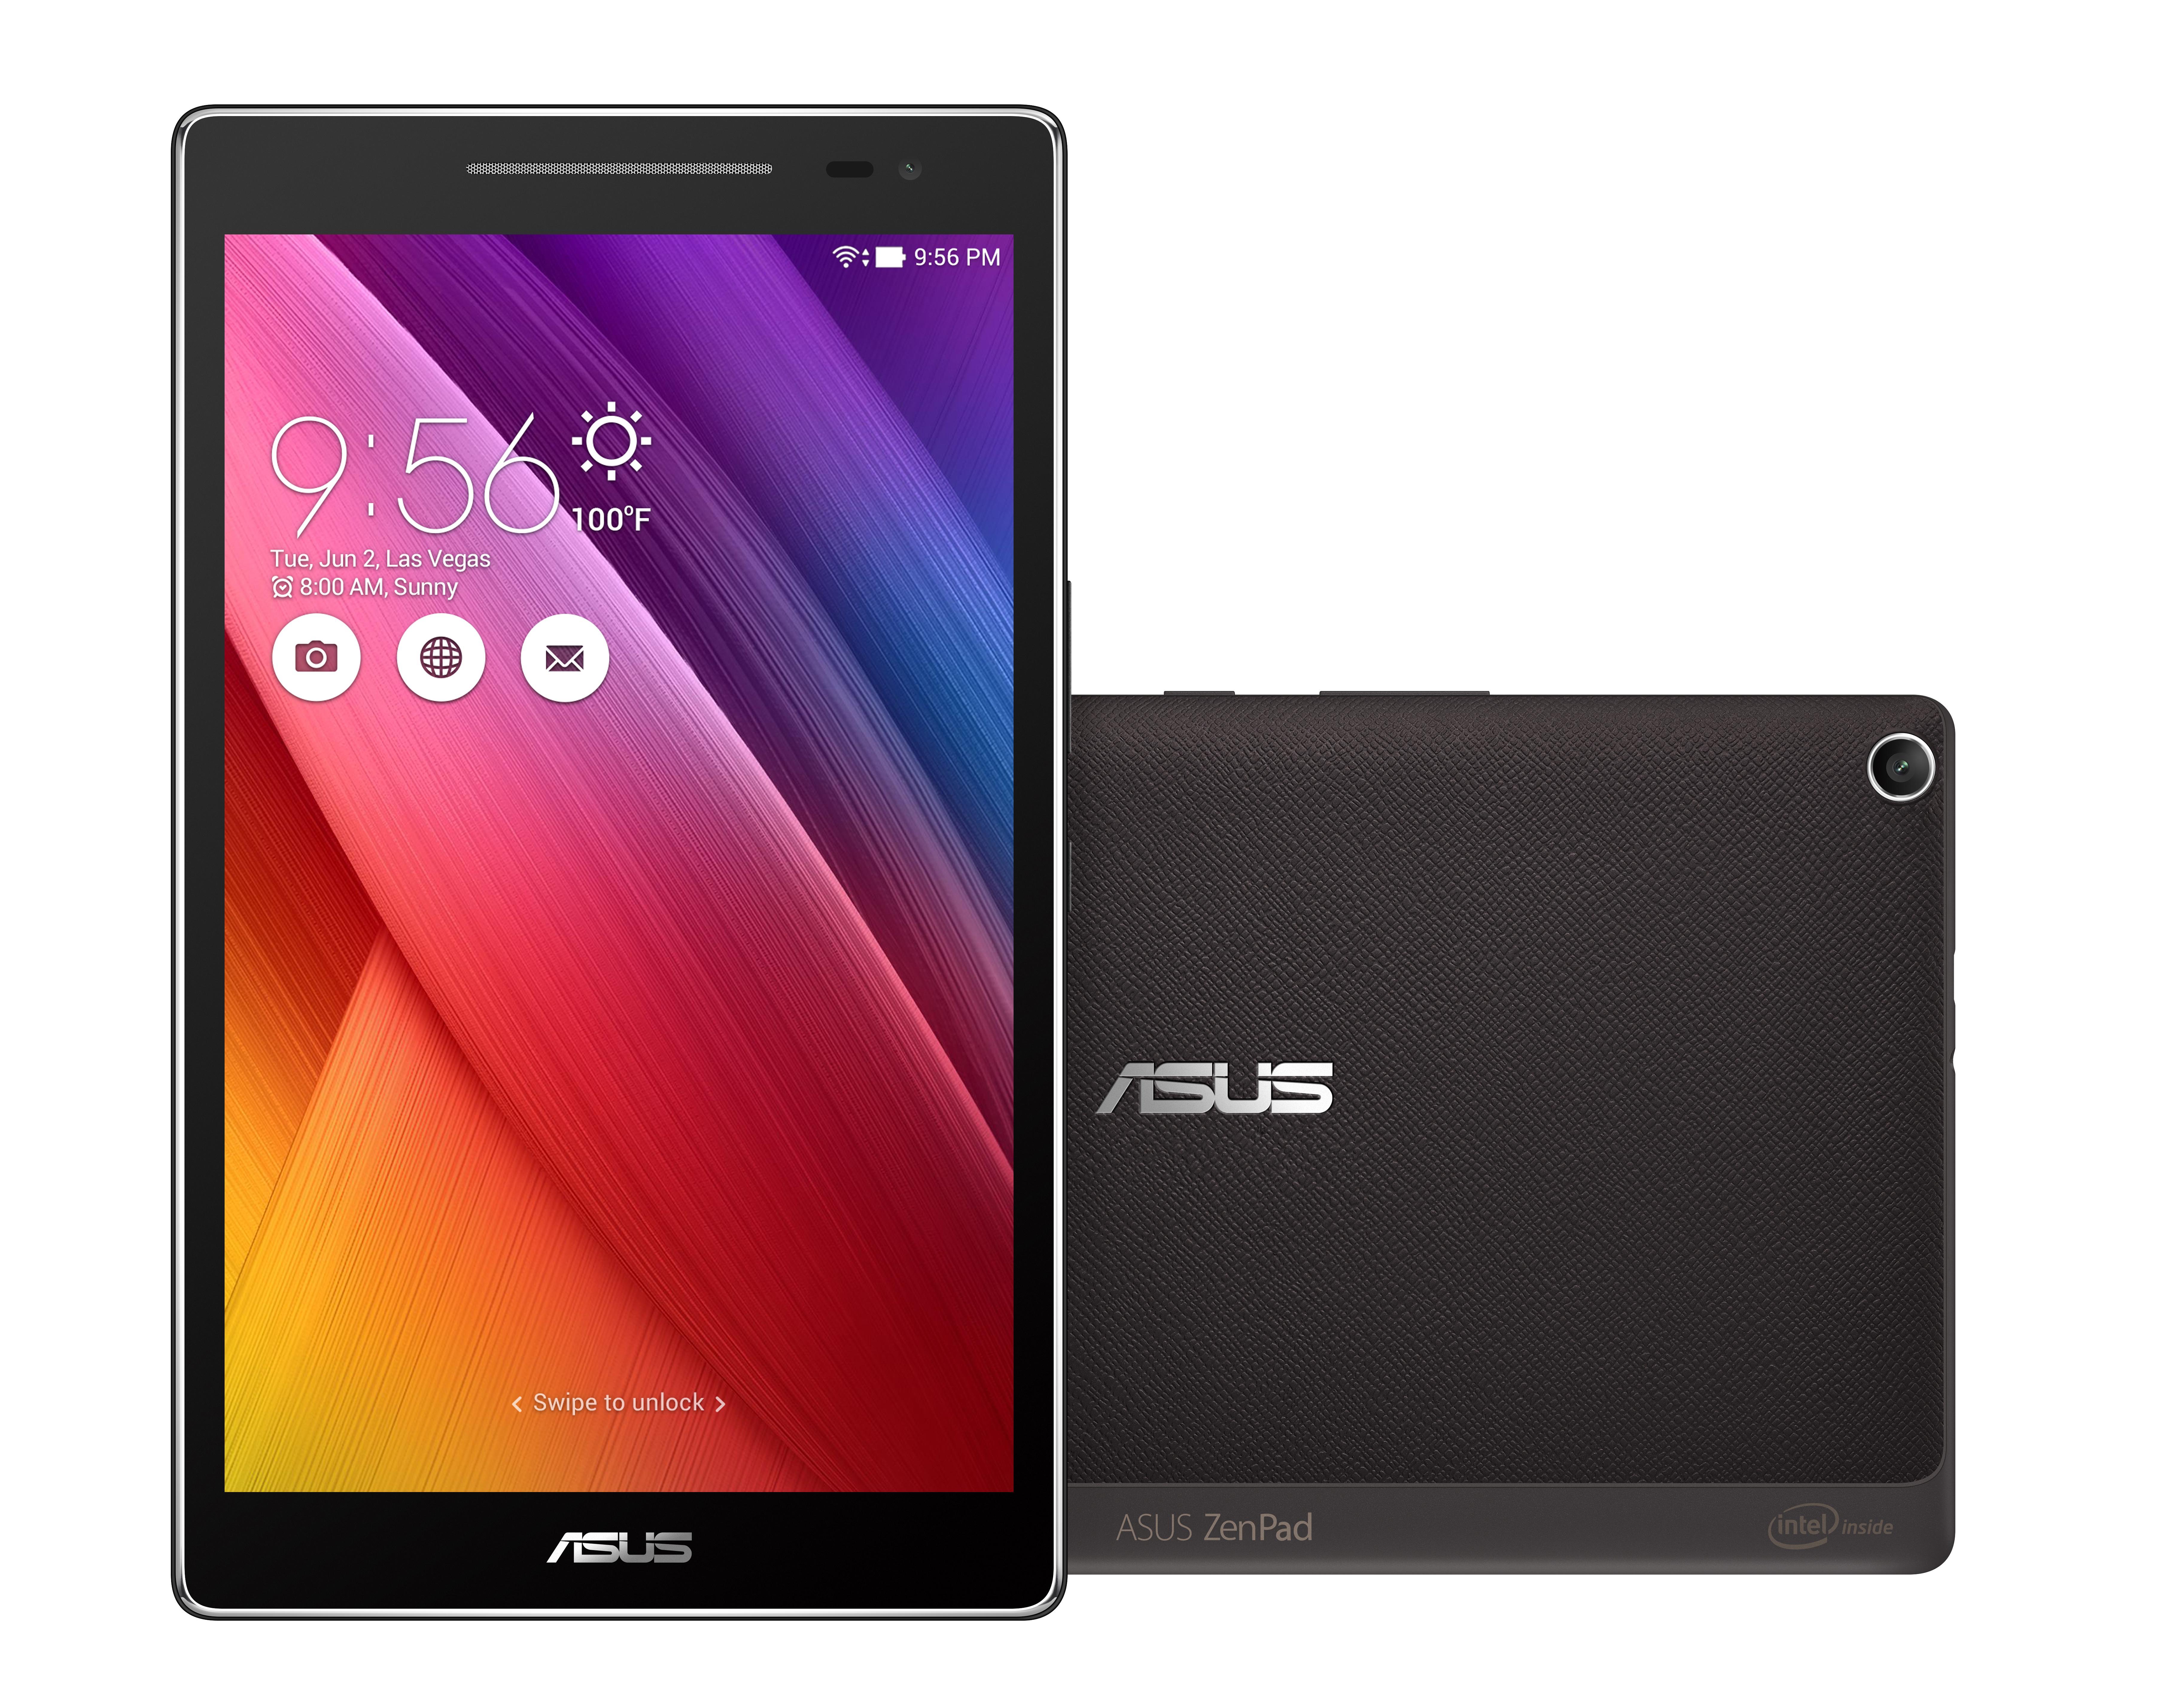 ASUS ZenPad Z380M-6A041A 16GB Black,Grey tablet